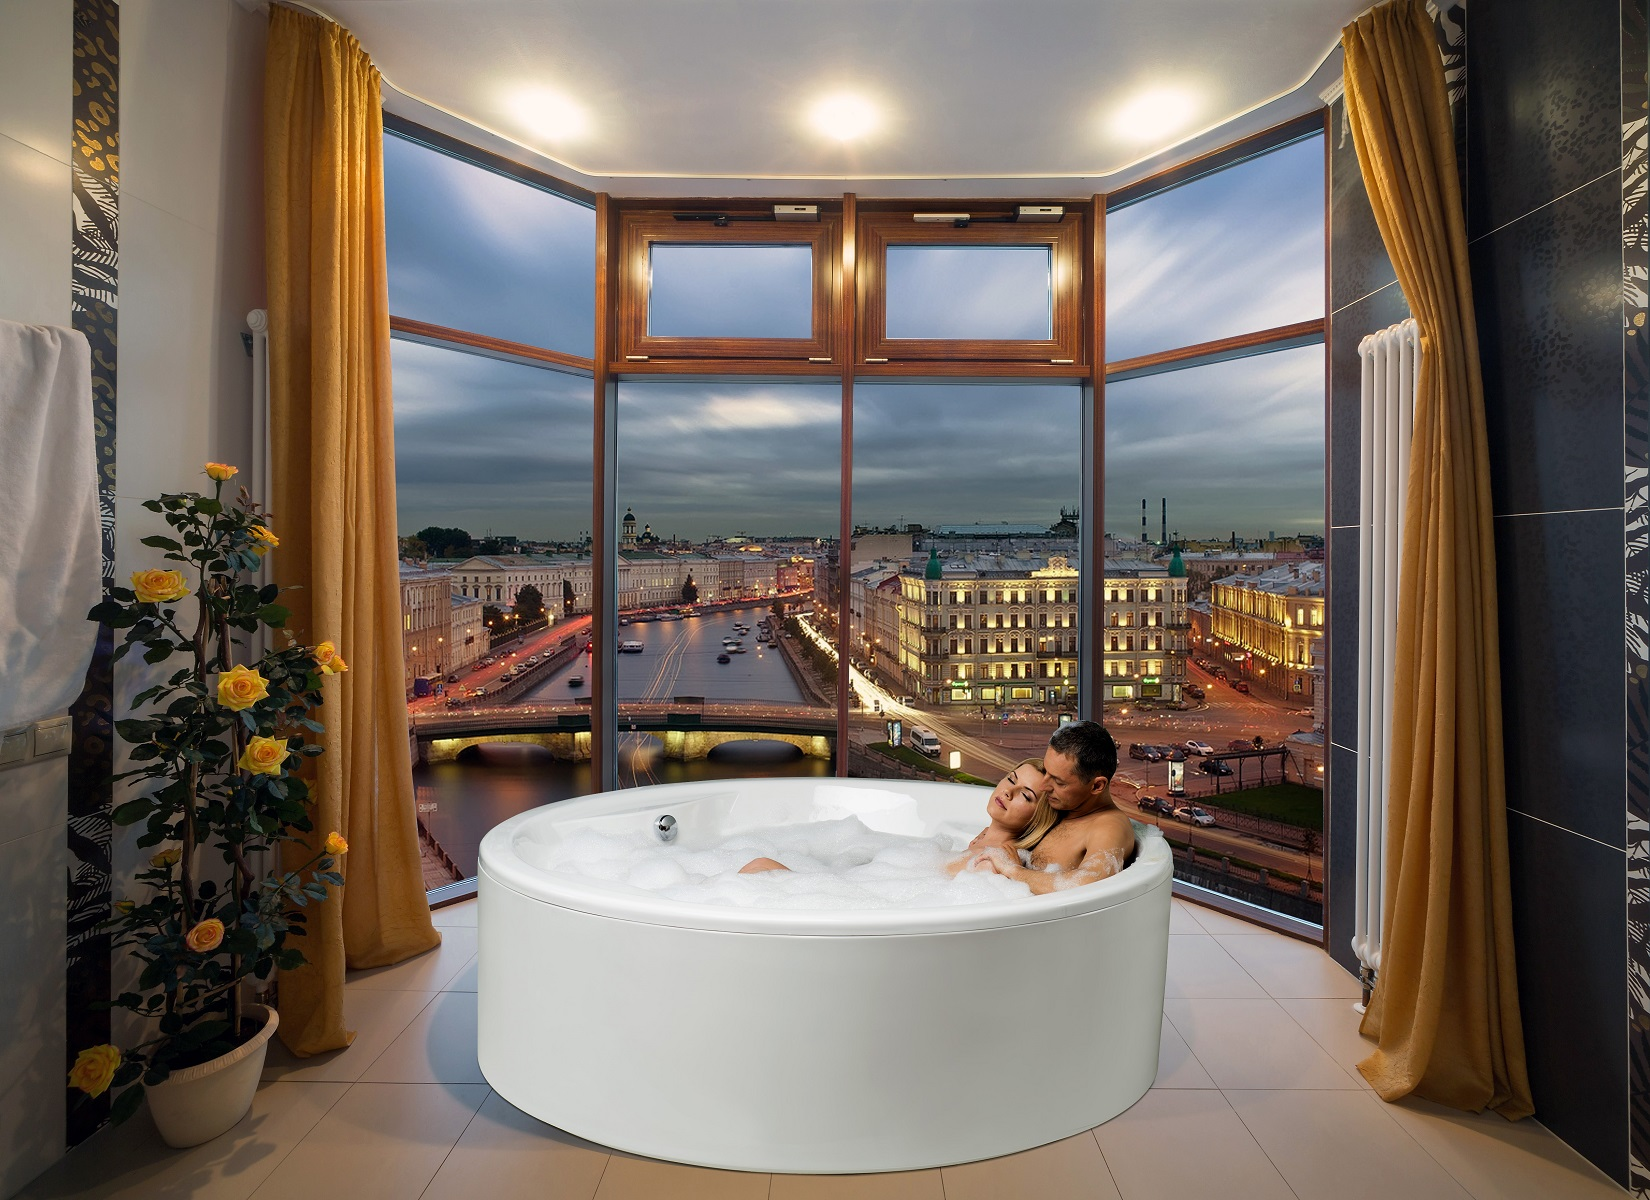 Materiale vasca da bagno 28 images vasche da bagno in - Materiale vasca da bagno ...